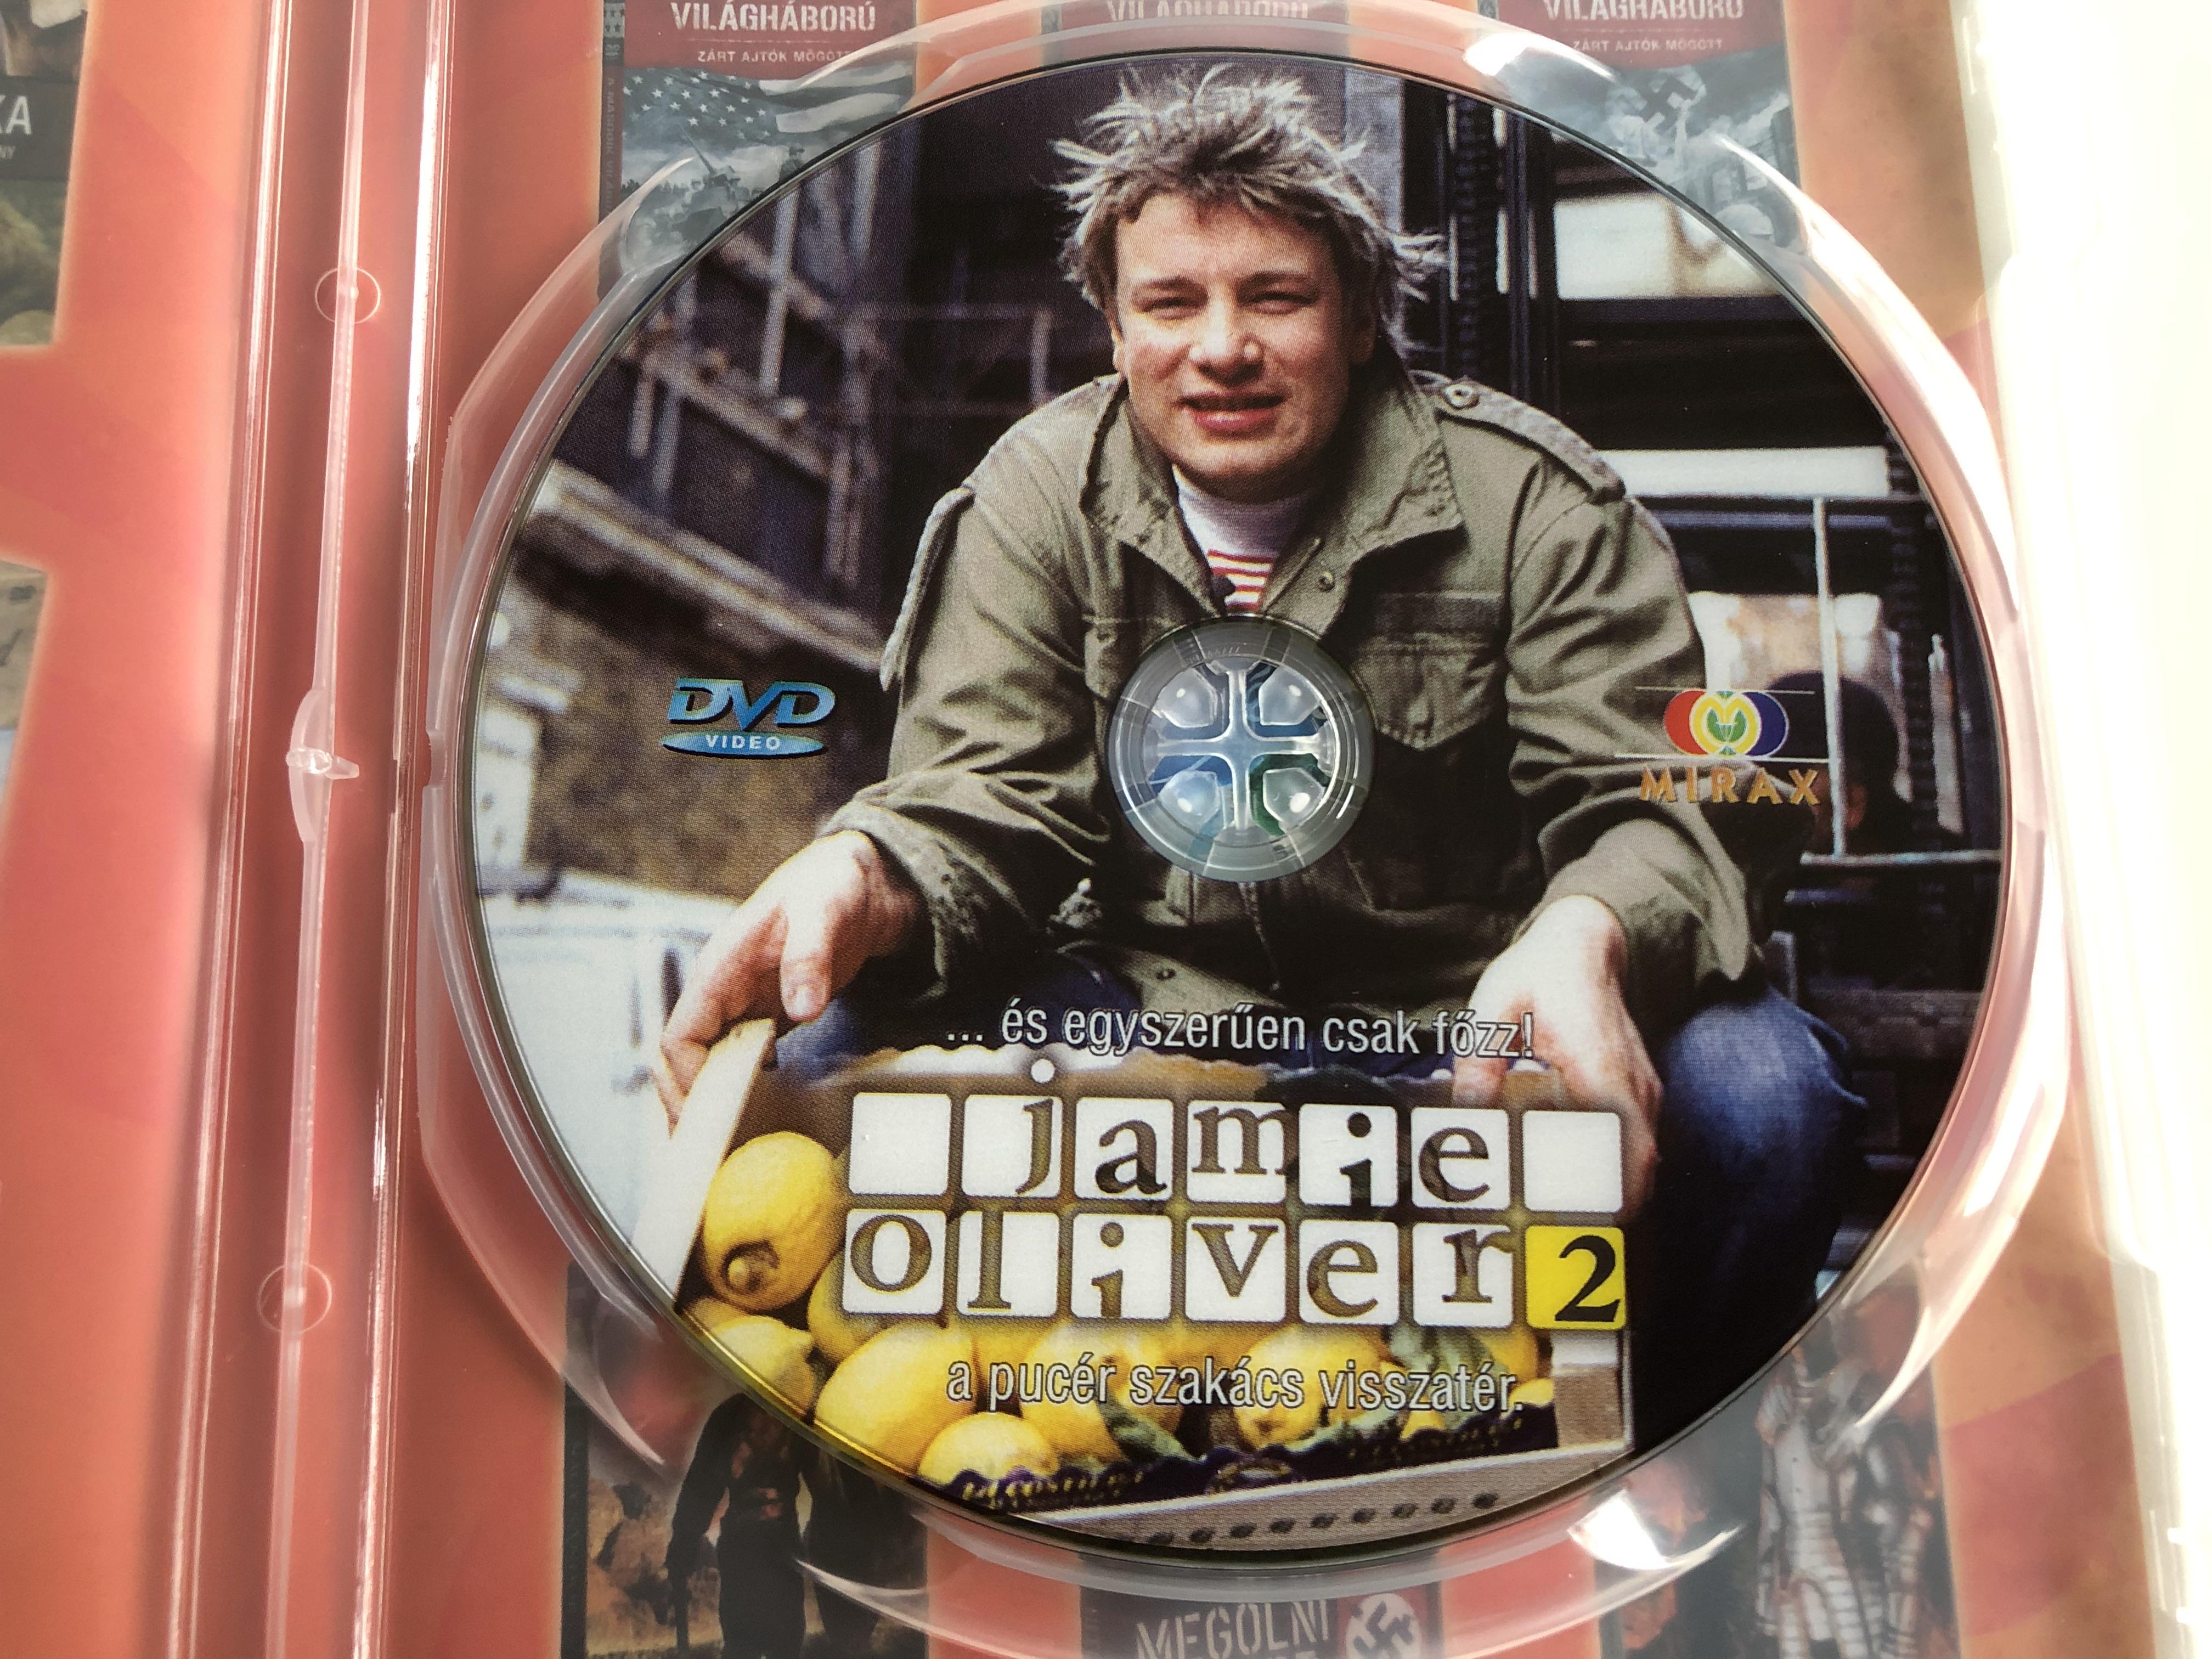 -oliver-s-twist-dvd-2002-jamie-oliver-vol.-2-2.jpg